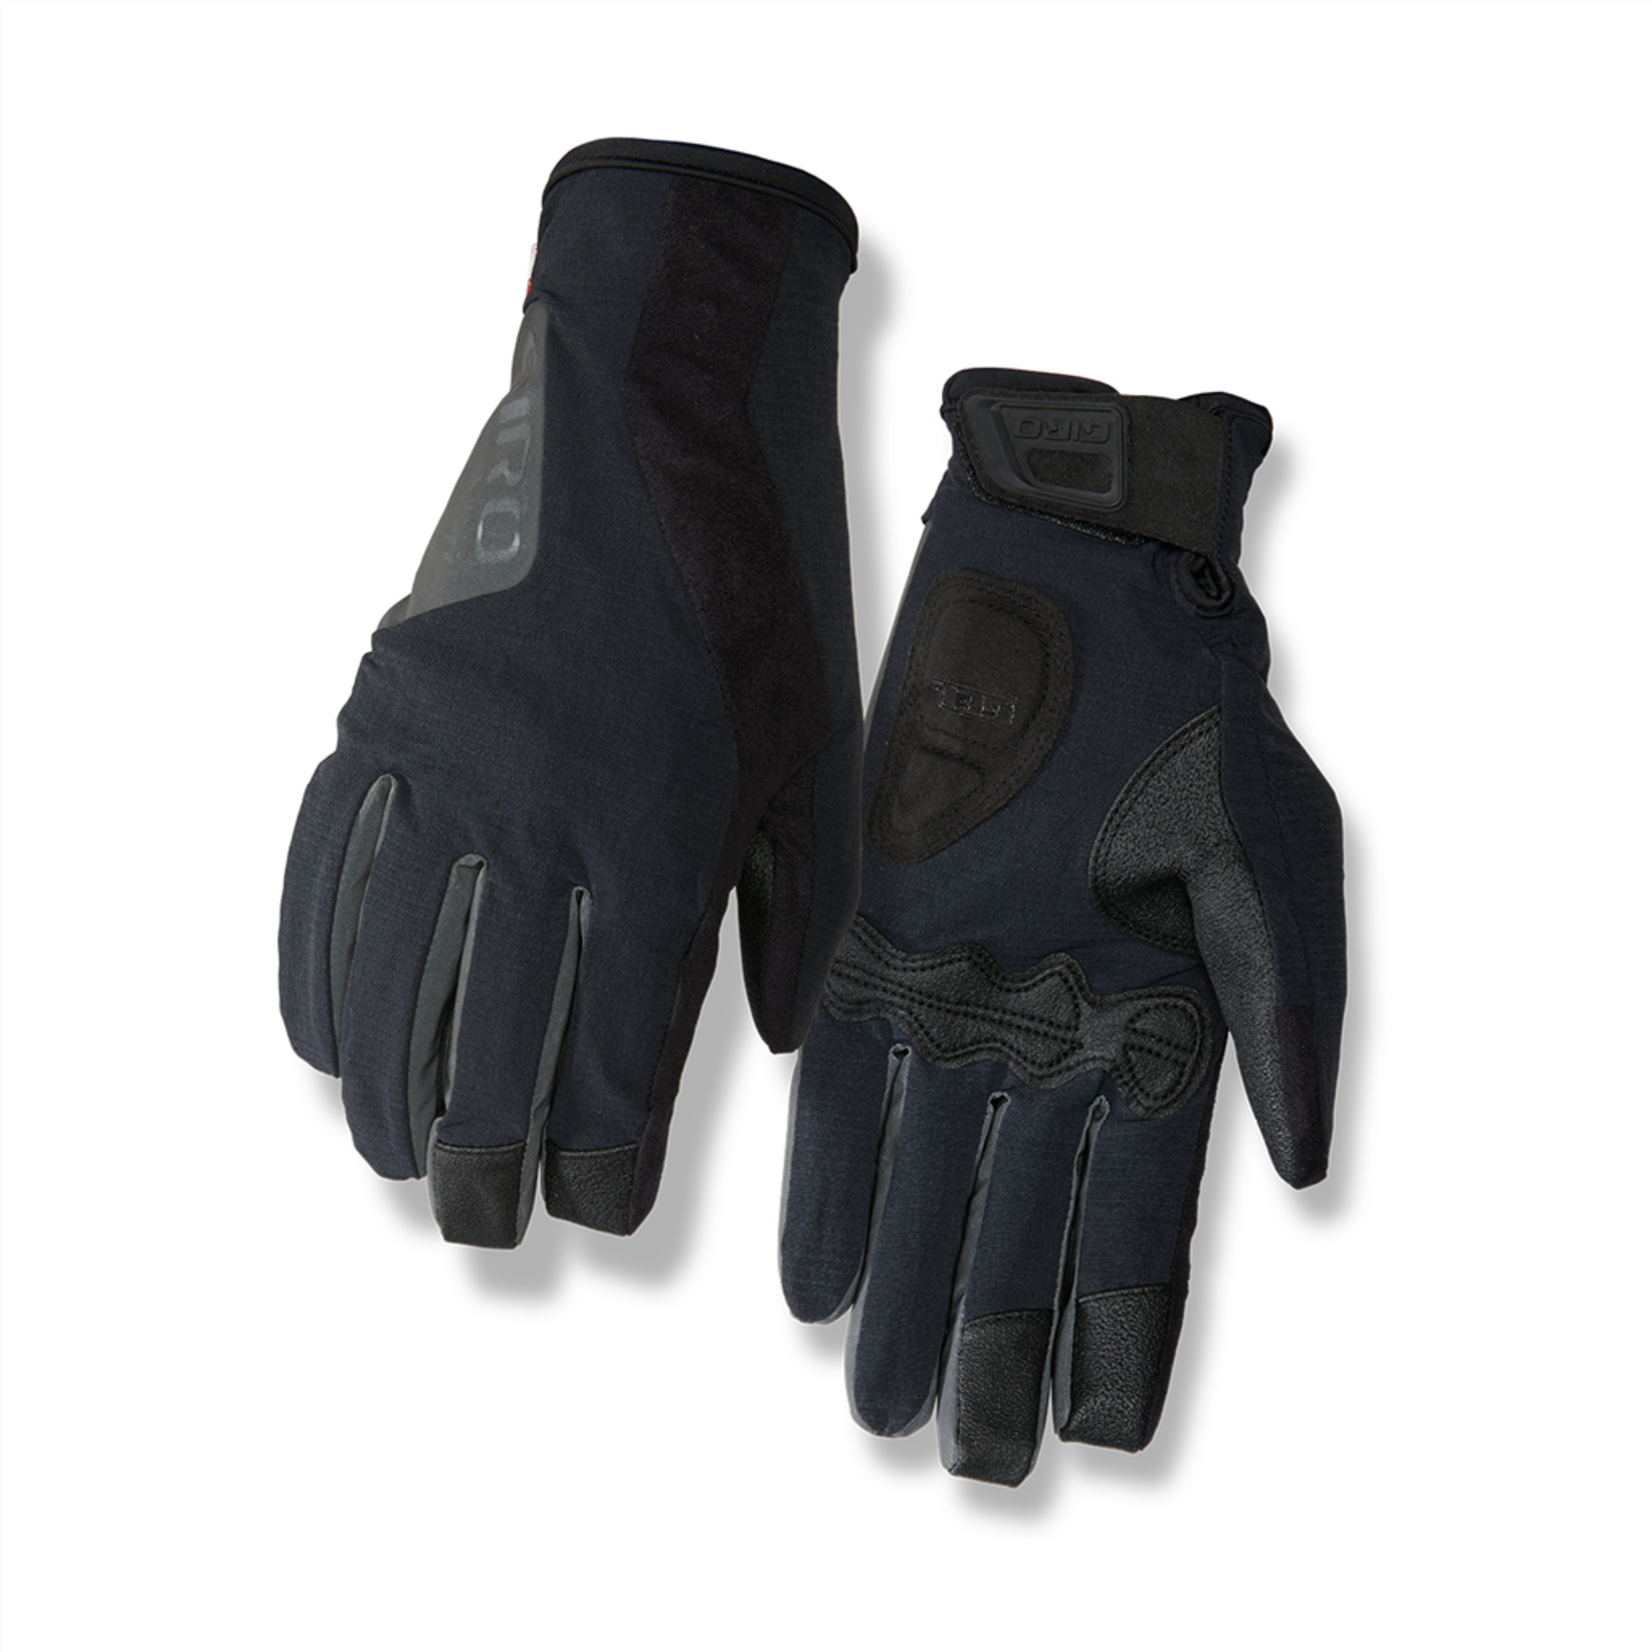 Giro Handschuhe Giro Pivot 2.0 Glove Taglia (M)